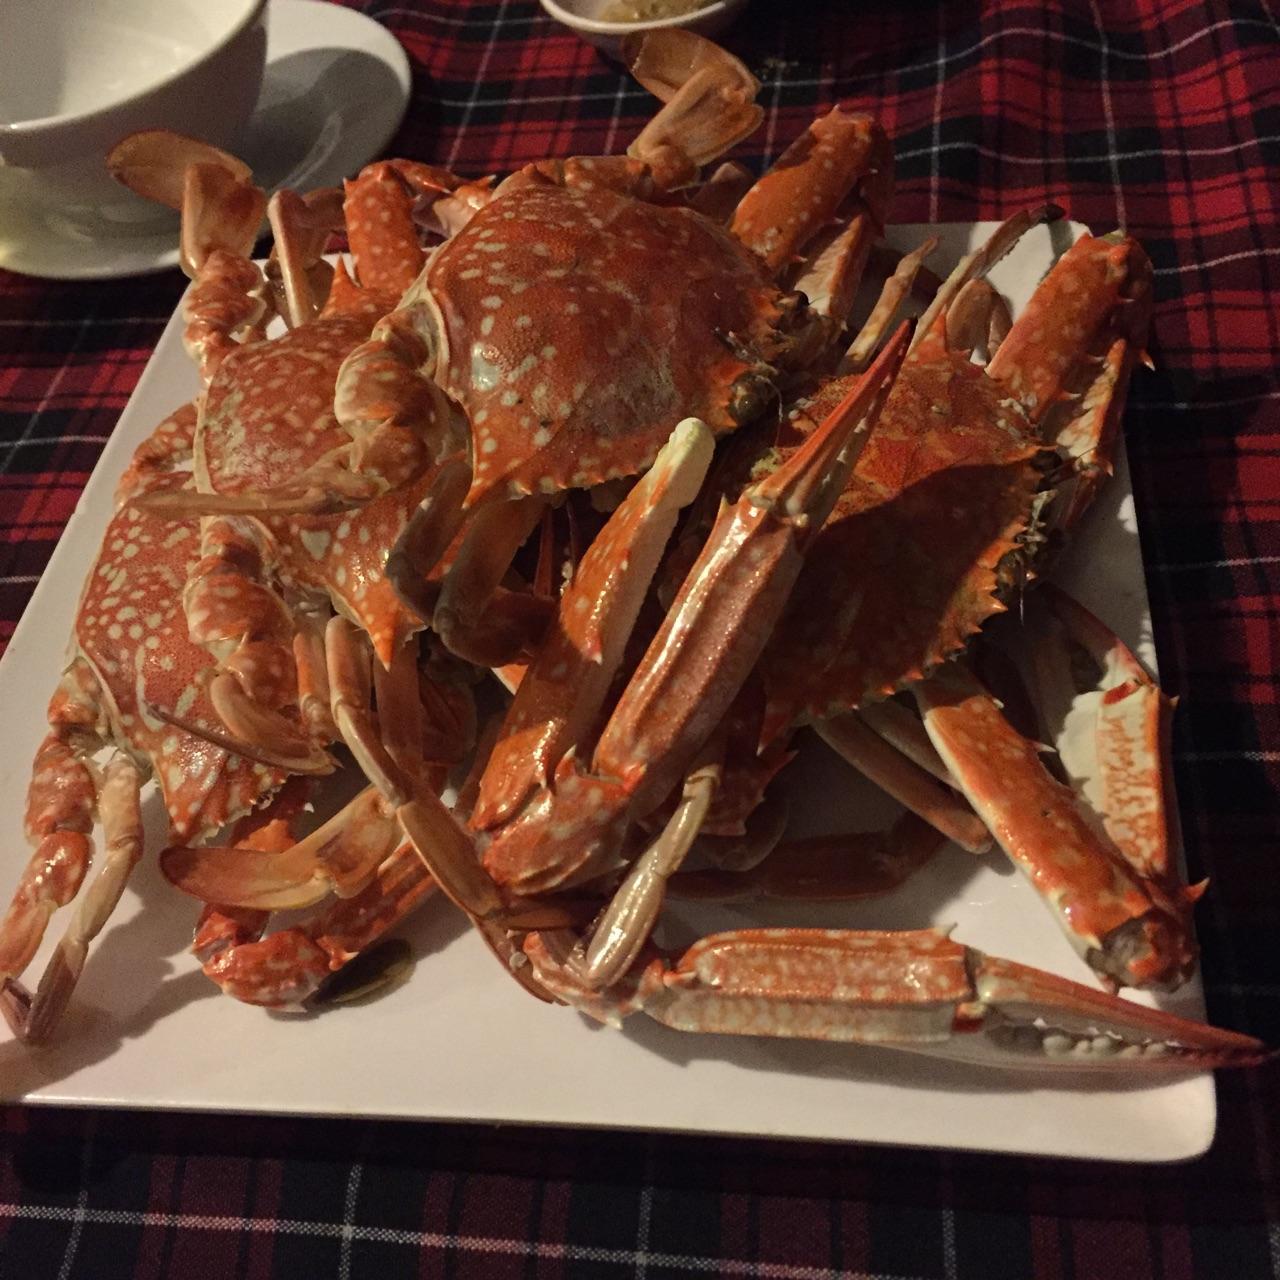 Fresh & tasty crab